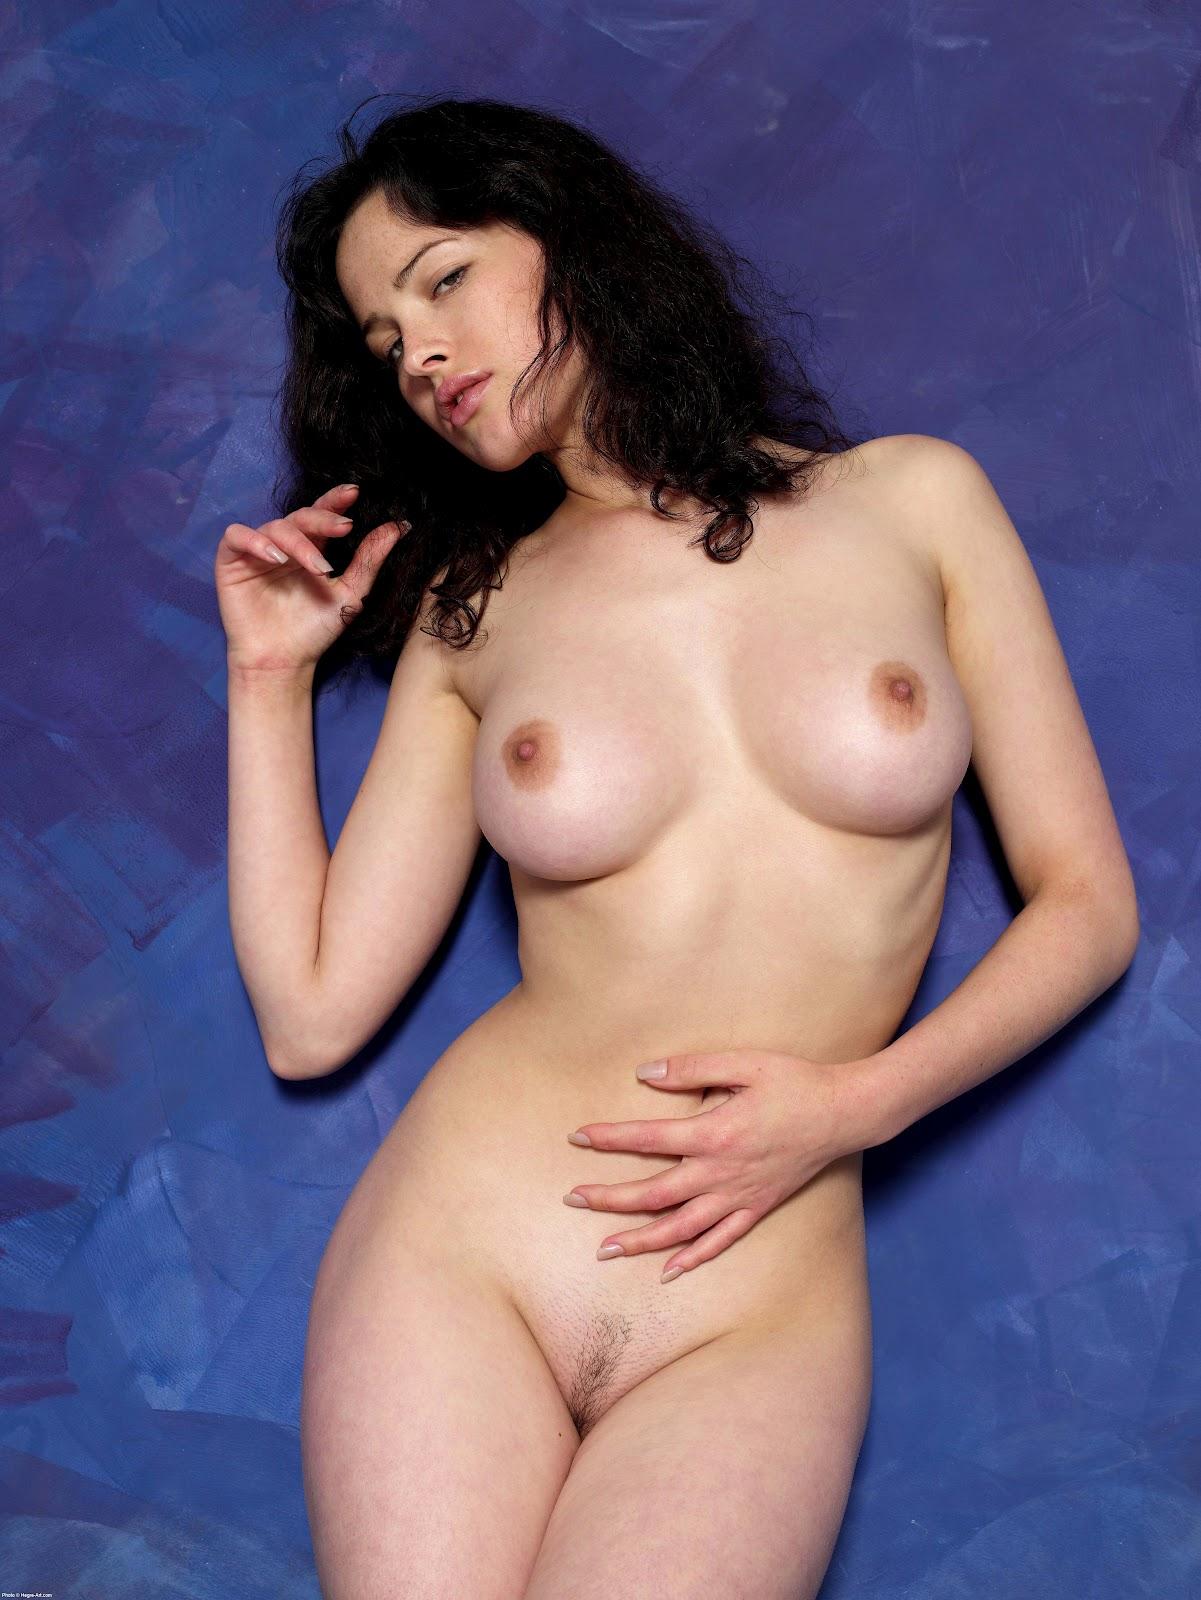 http://4.bp.blogspot.com/-HtOVR7wM7Tw/Tzp-gf-aDZI/AAAAAAAAG6s/_J88FshVnPI/s1600/dasha_astafieva-hot-nude_55.jpg